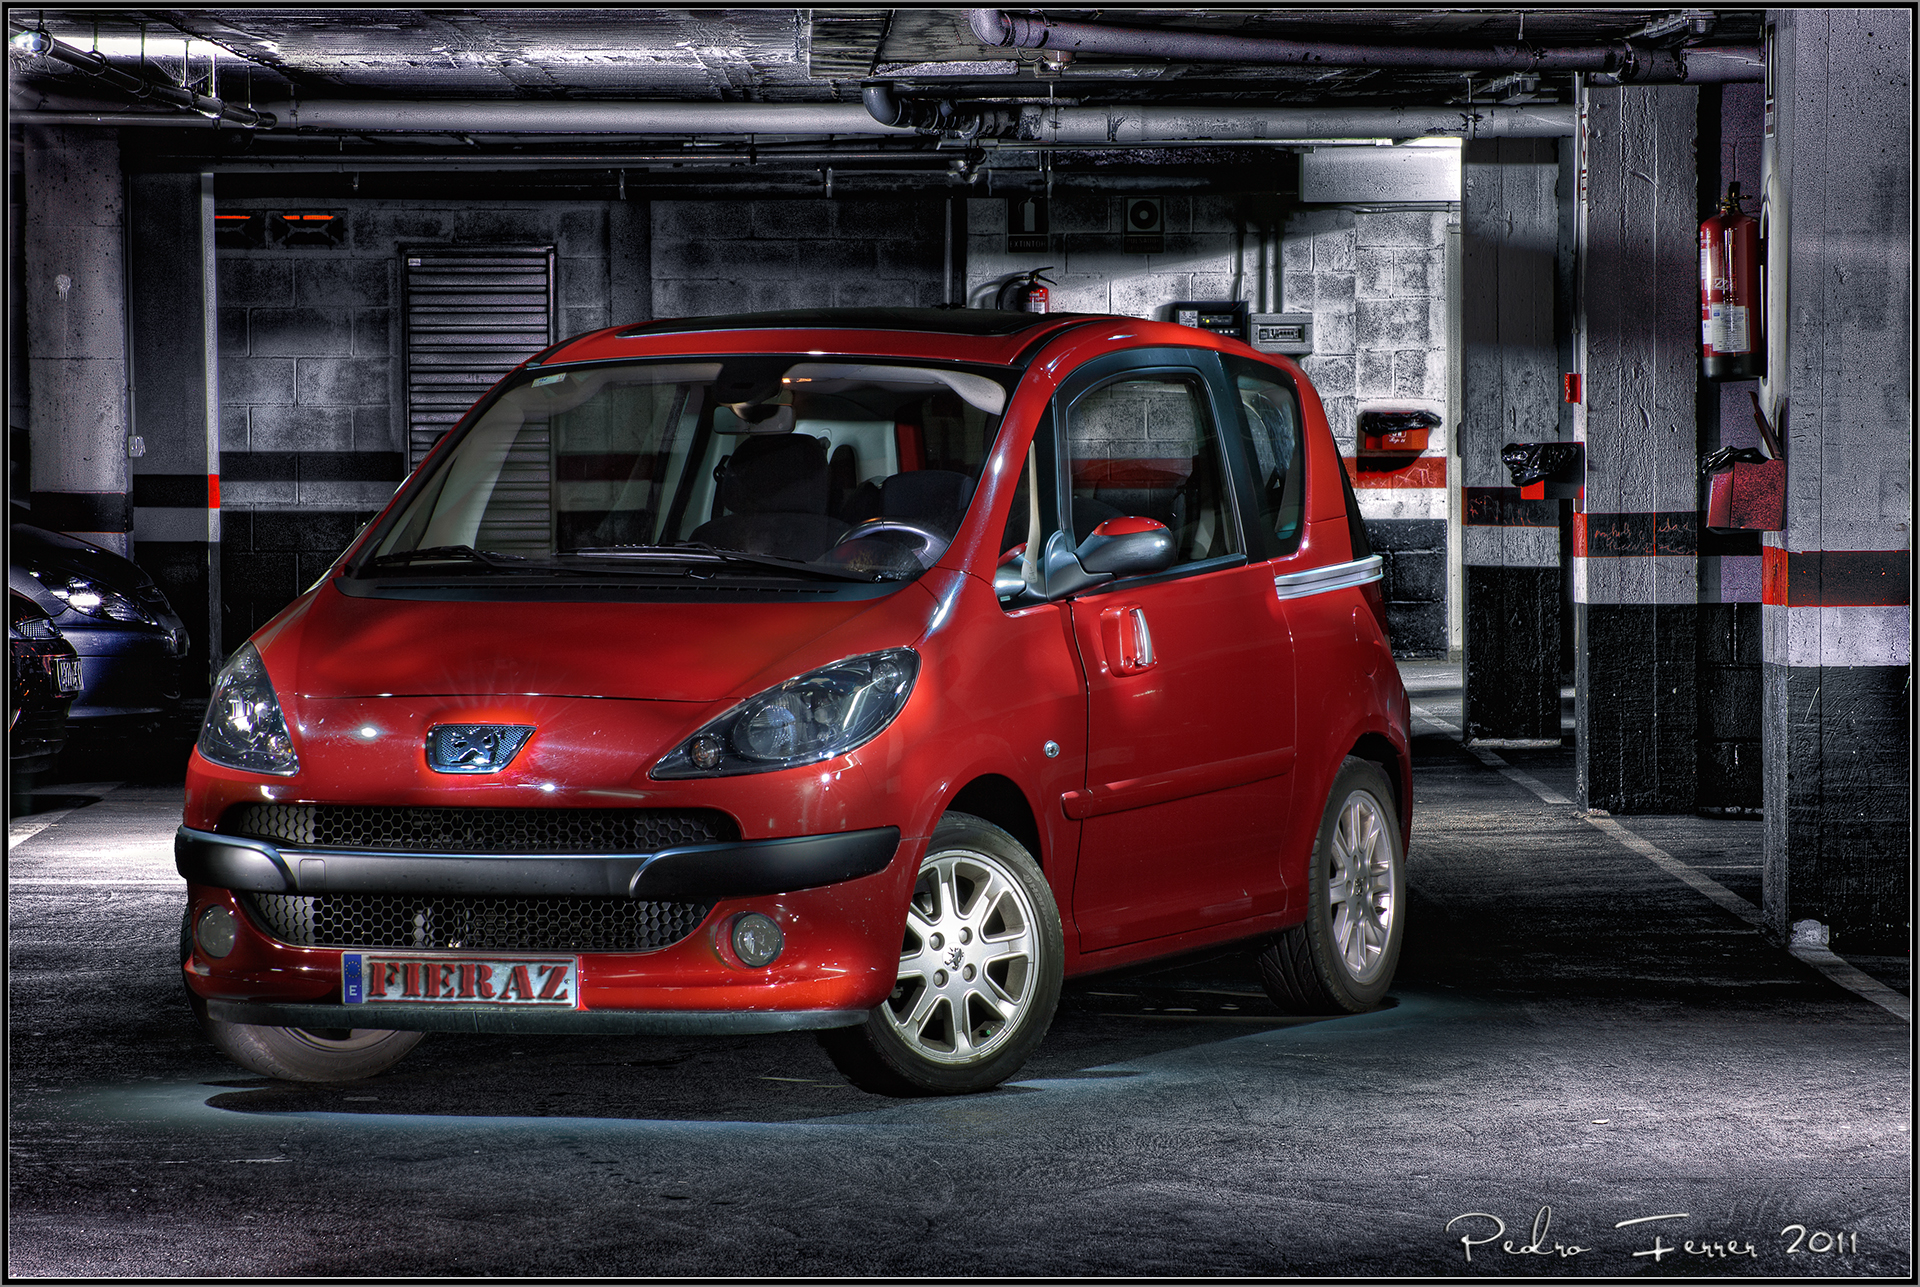 Coche en garaje auto design tech - Garaje de coches ...